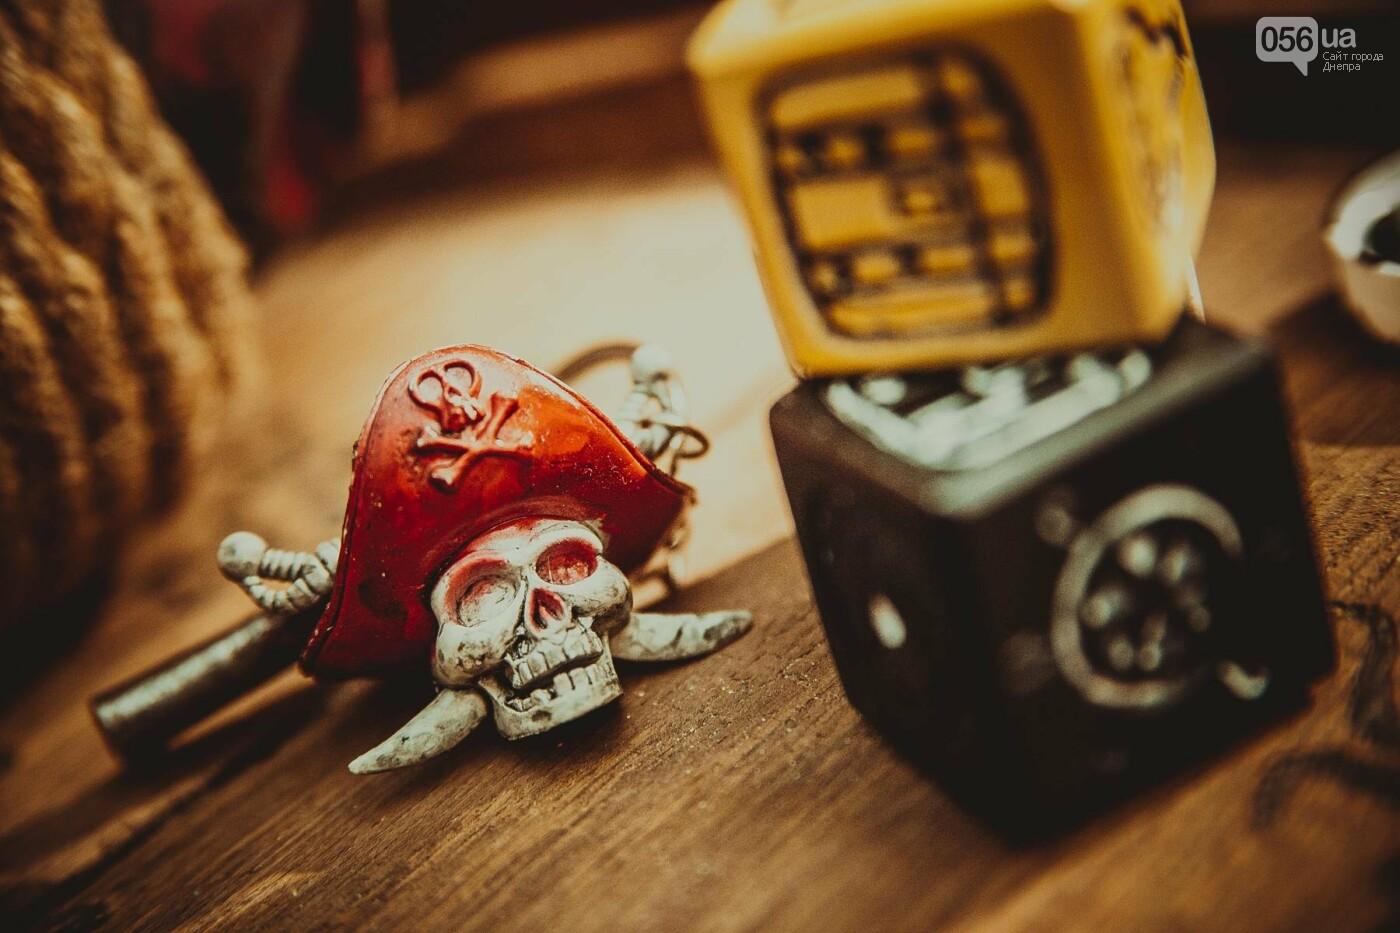 Неверояно, но факт: в Днепре появились пираты!, фото-5